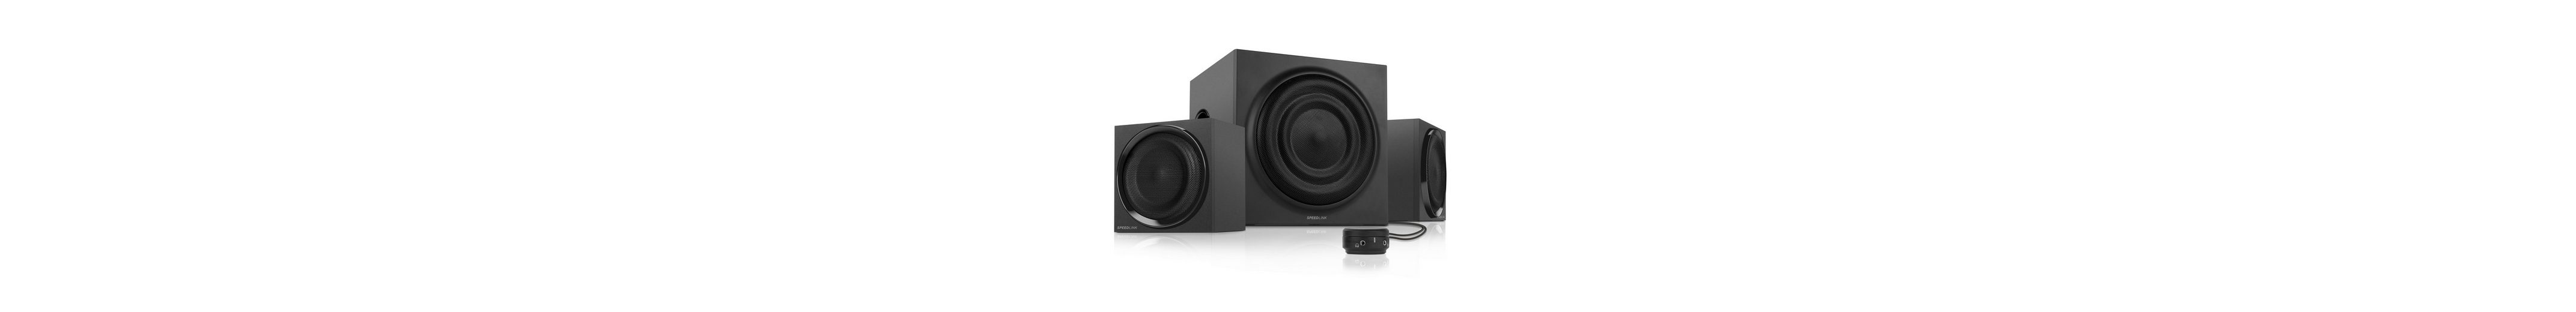 SPEEDLINK 2.1-Lautsprechersystem »QUANUM 2.1 Subwoofer System Lautsprecher«